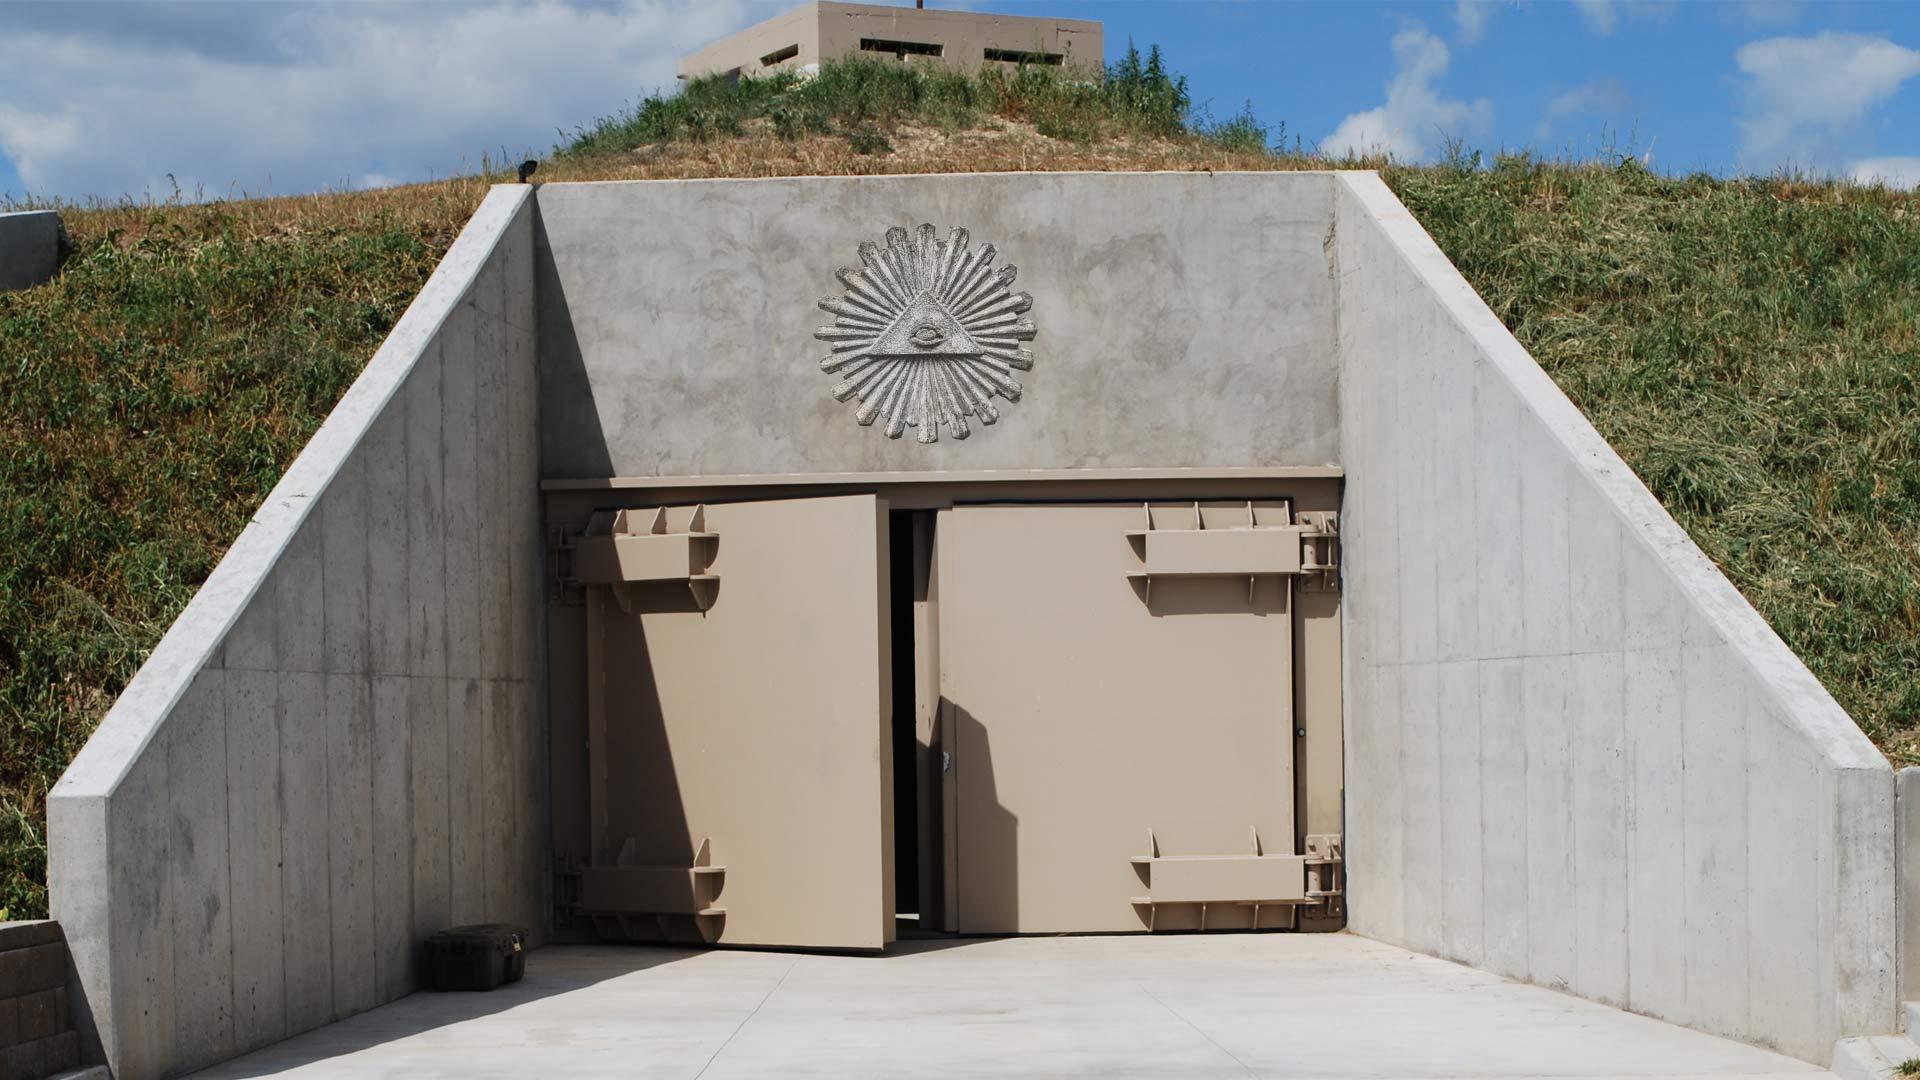 Masonic bunker